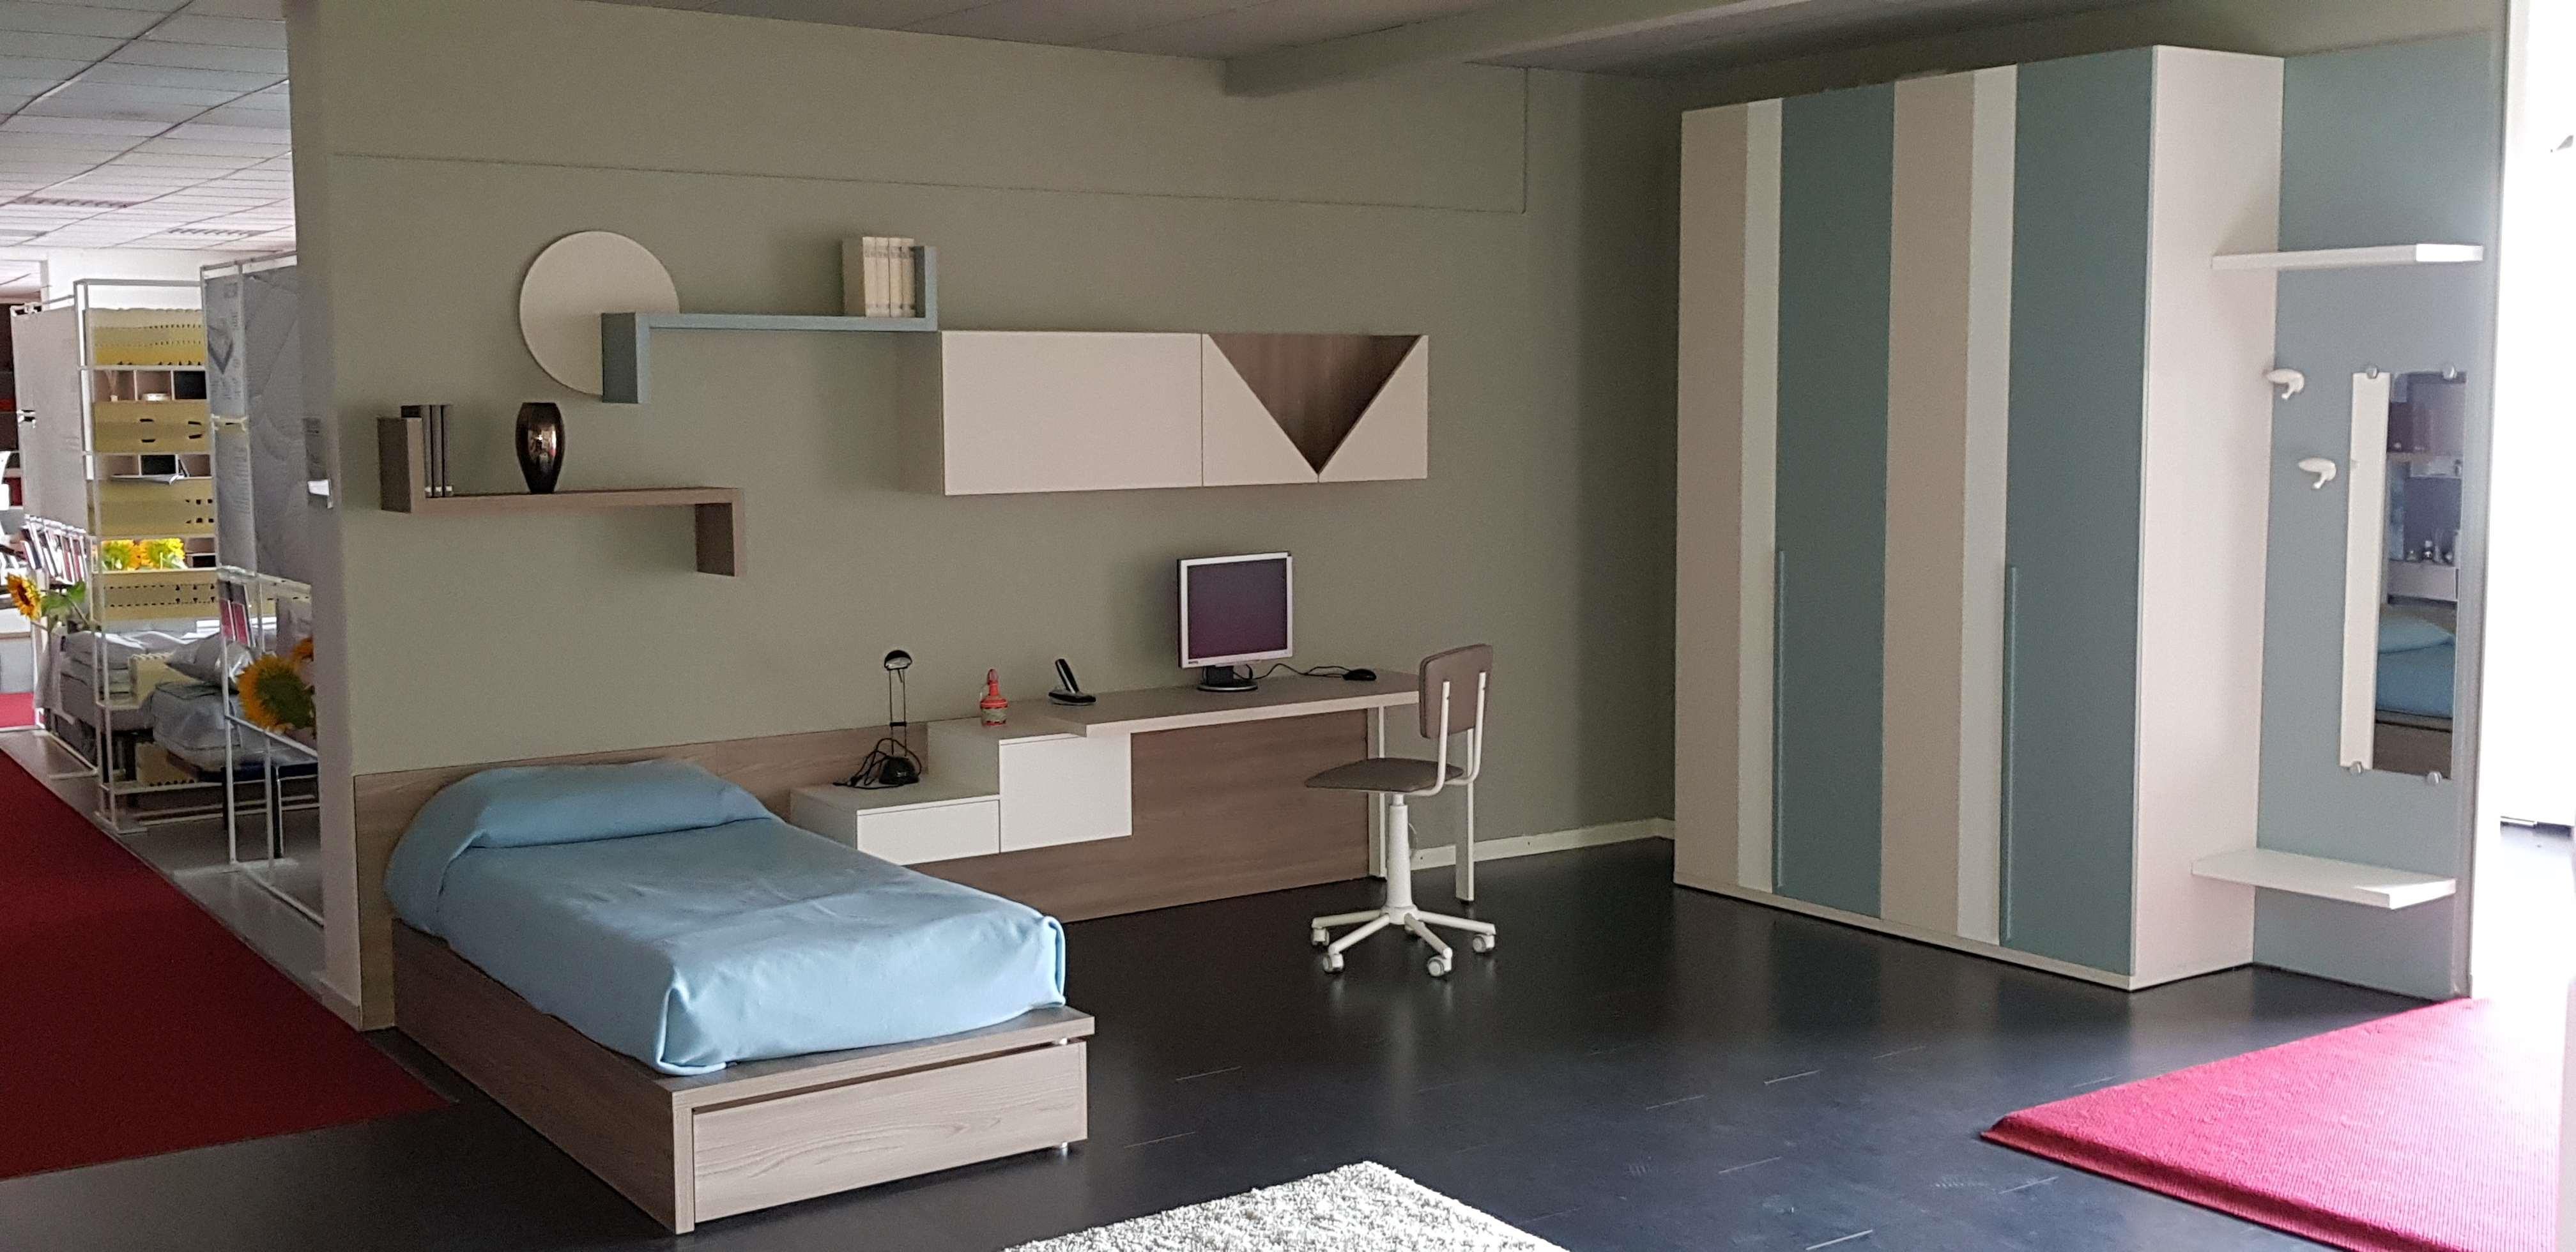 Best Doimo Cityline Camerette Photos - Home Design Ideas 2017 ...